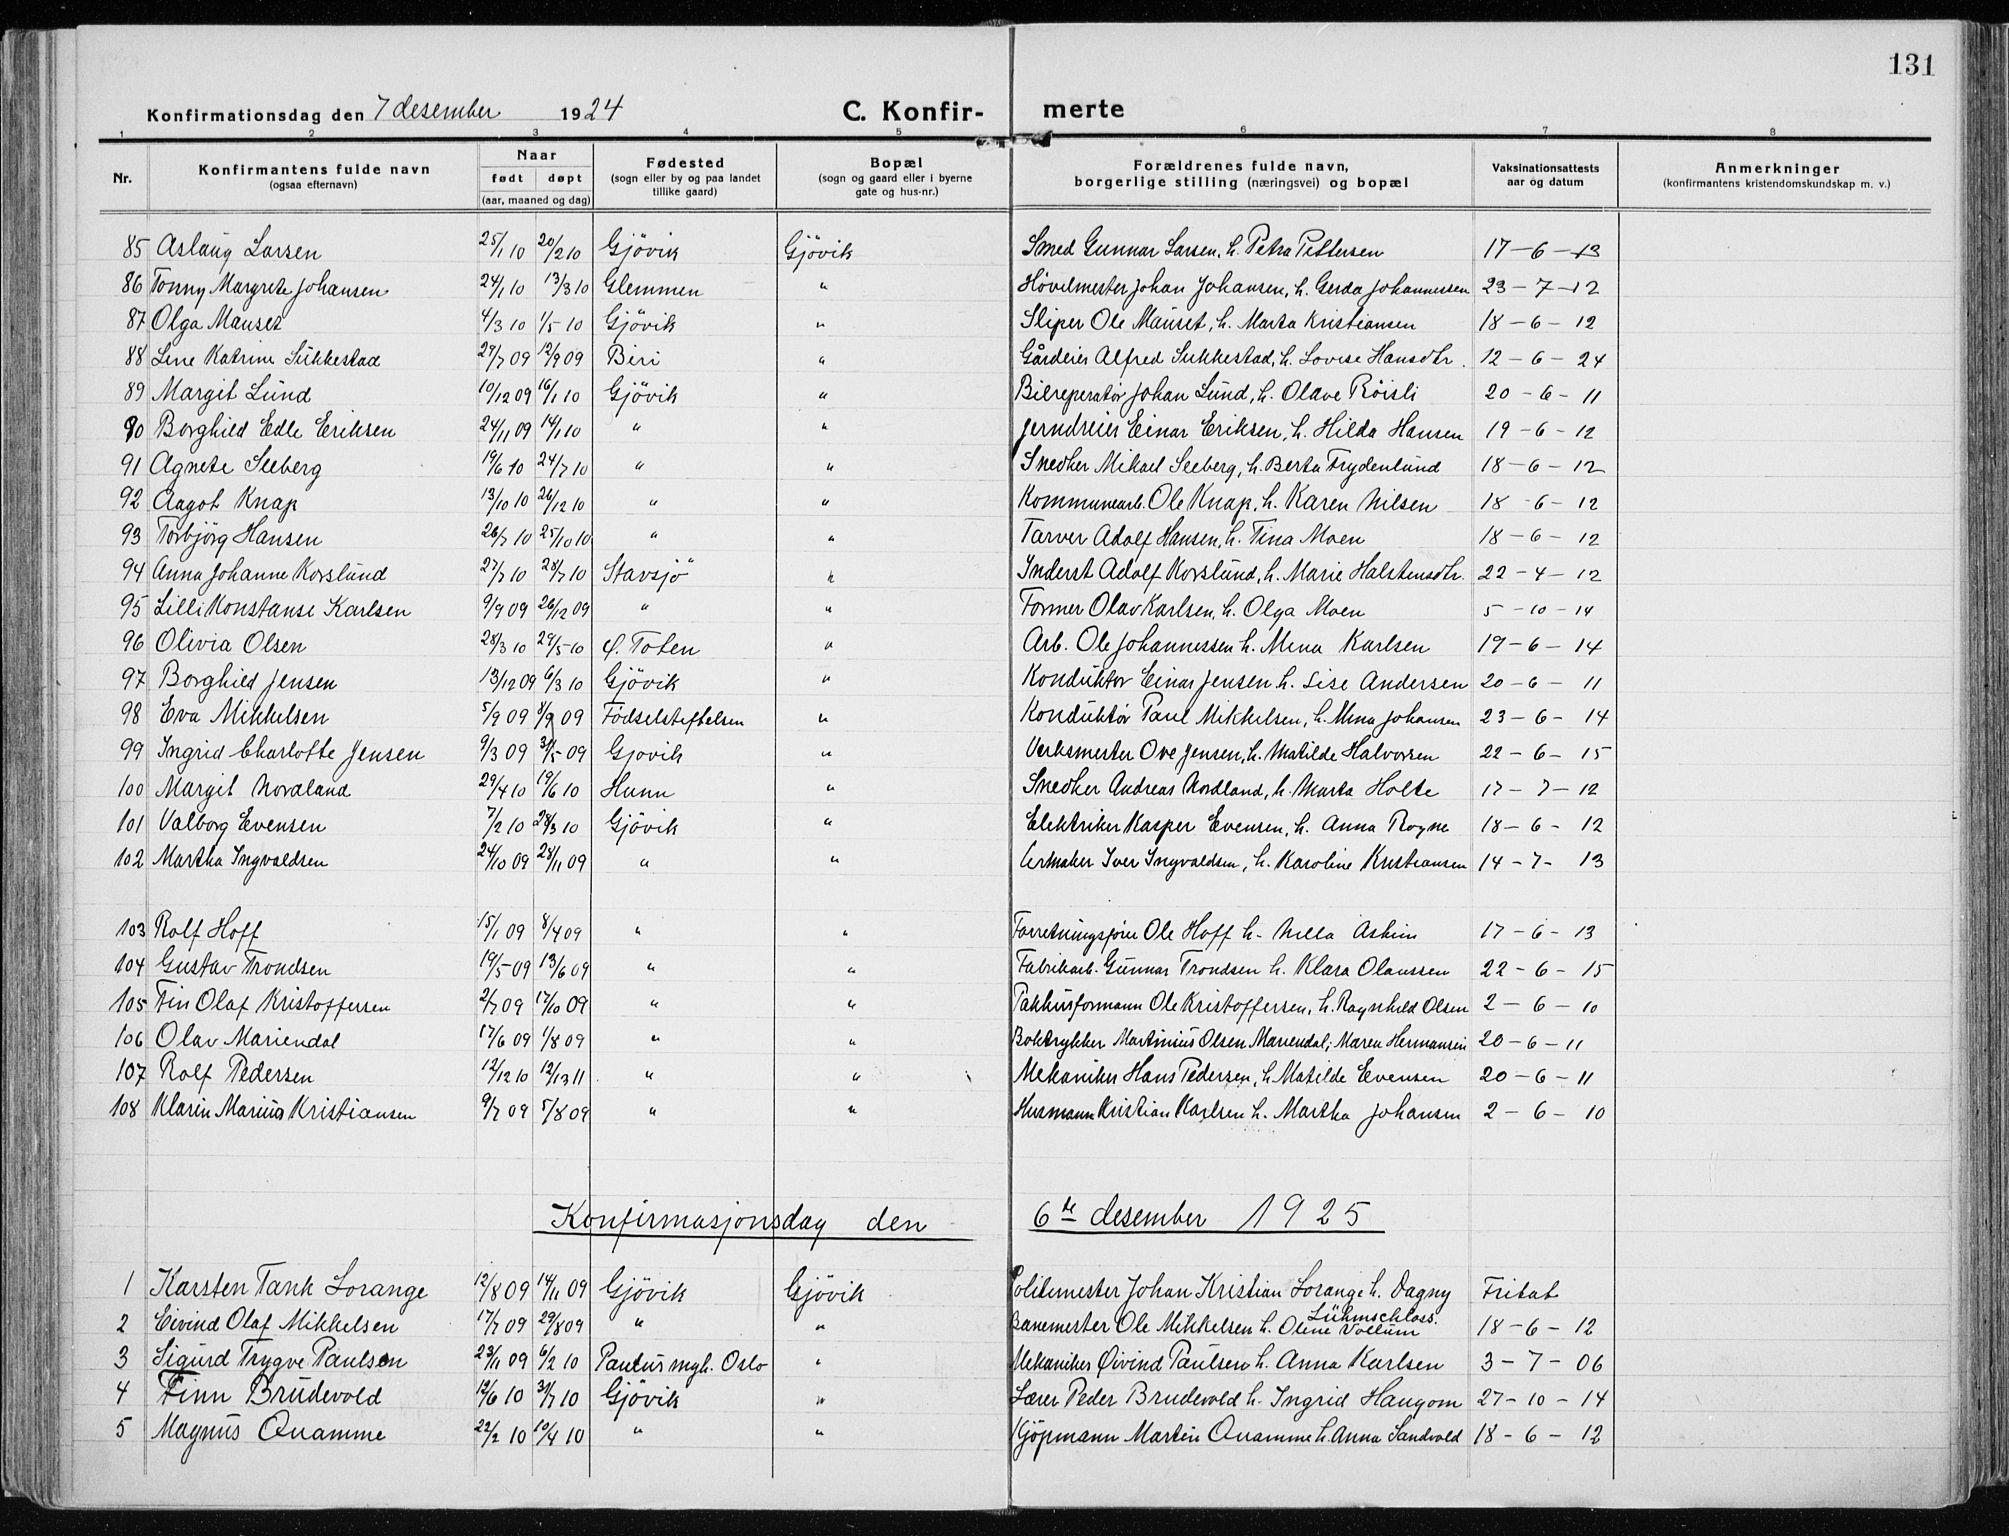 SAH, Vardal prestekontor, H/Ha/Haa/L0015: Ministerialbok nr. 15, 1923-1937, s. 131